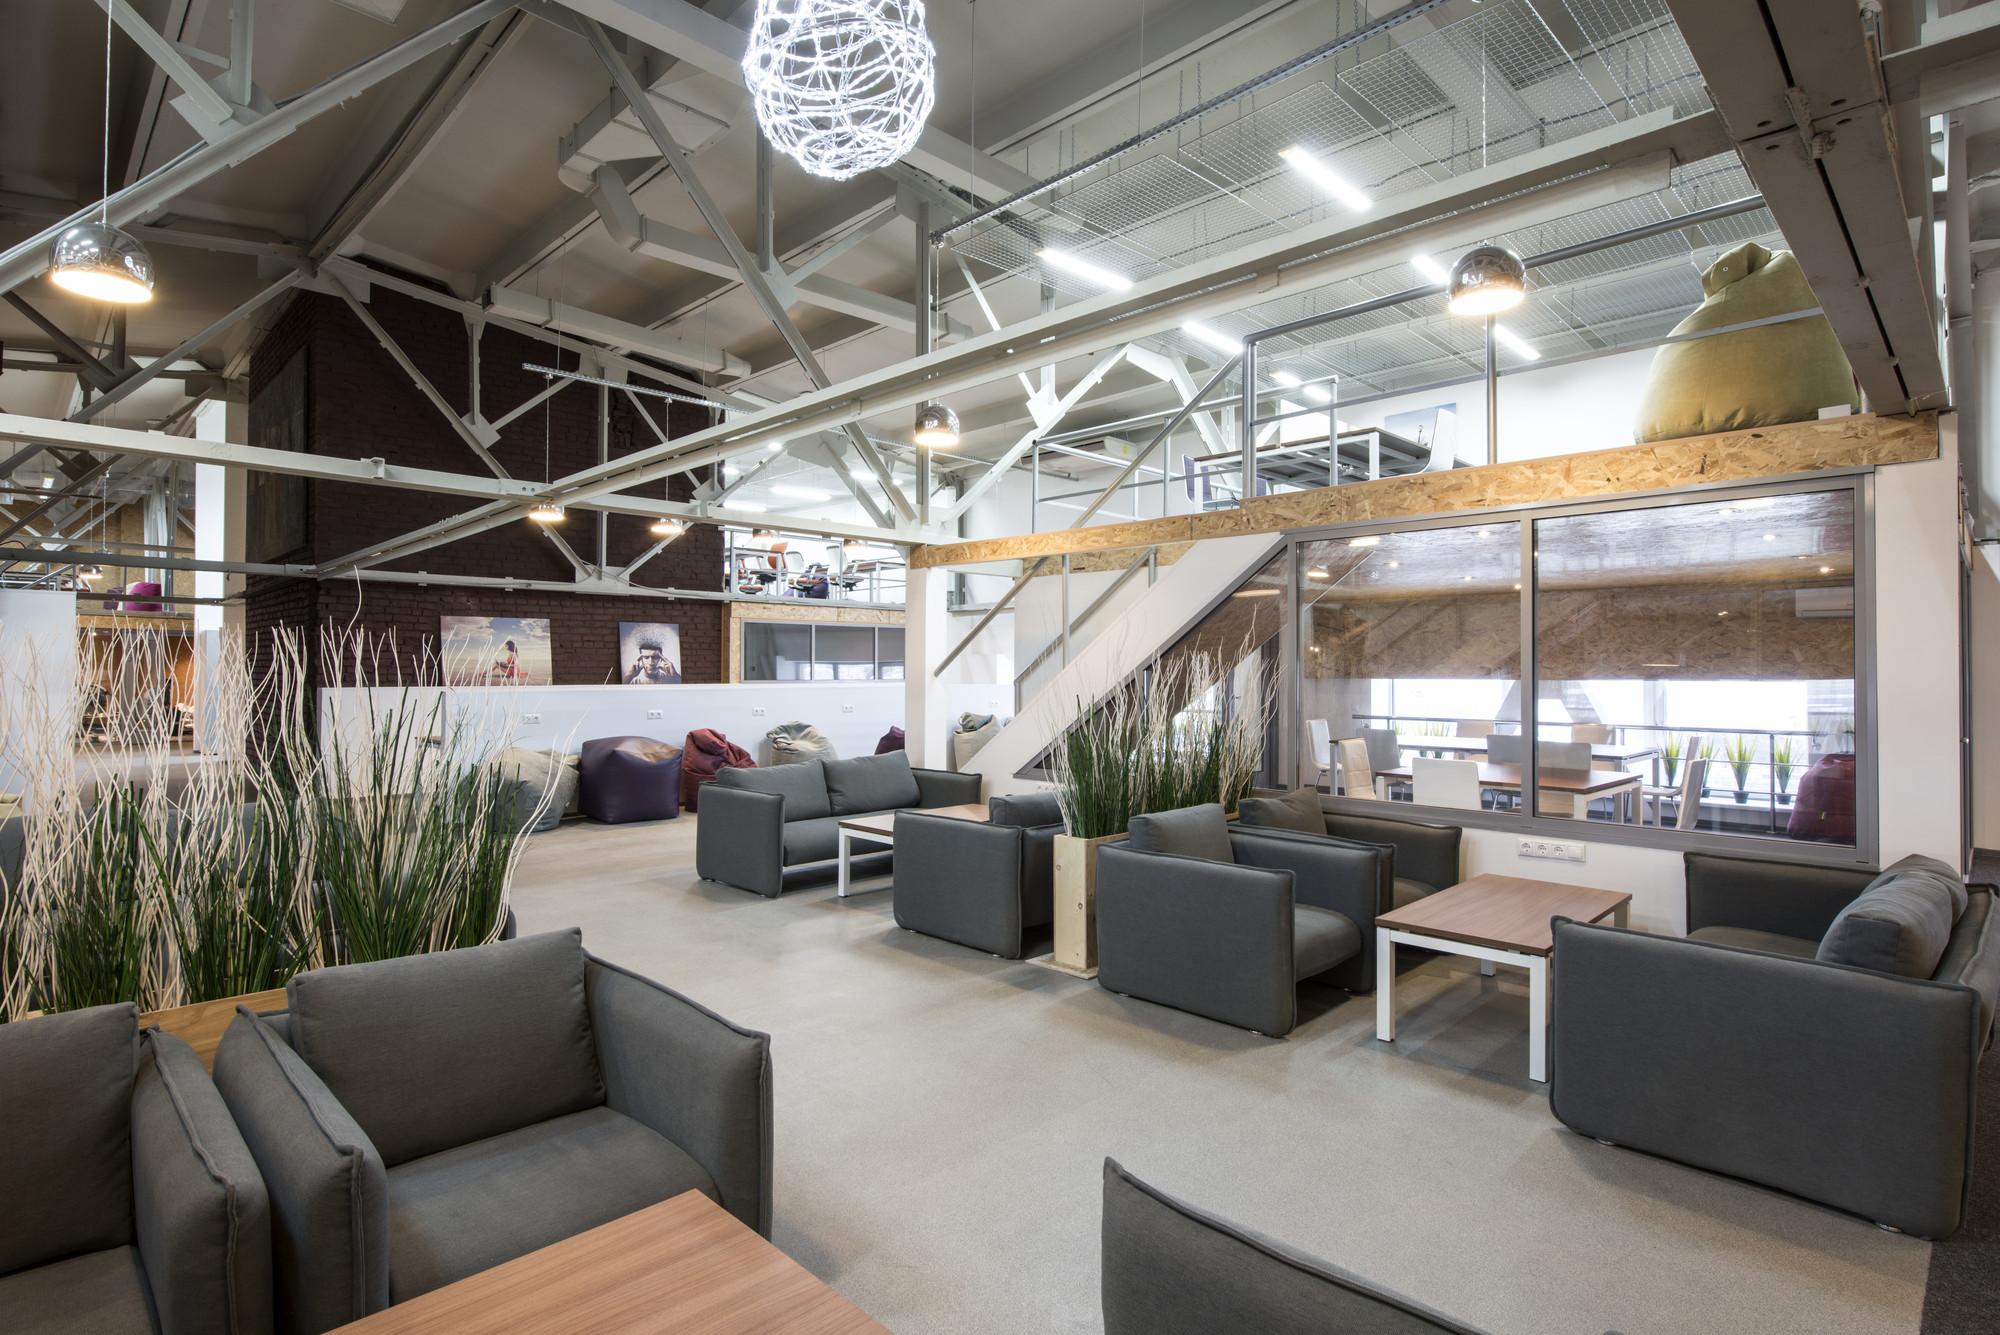 Gallery of nagatino 2 0 coworking center ruslan aydarov for Architecture studio design company